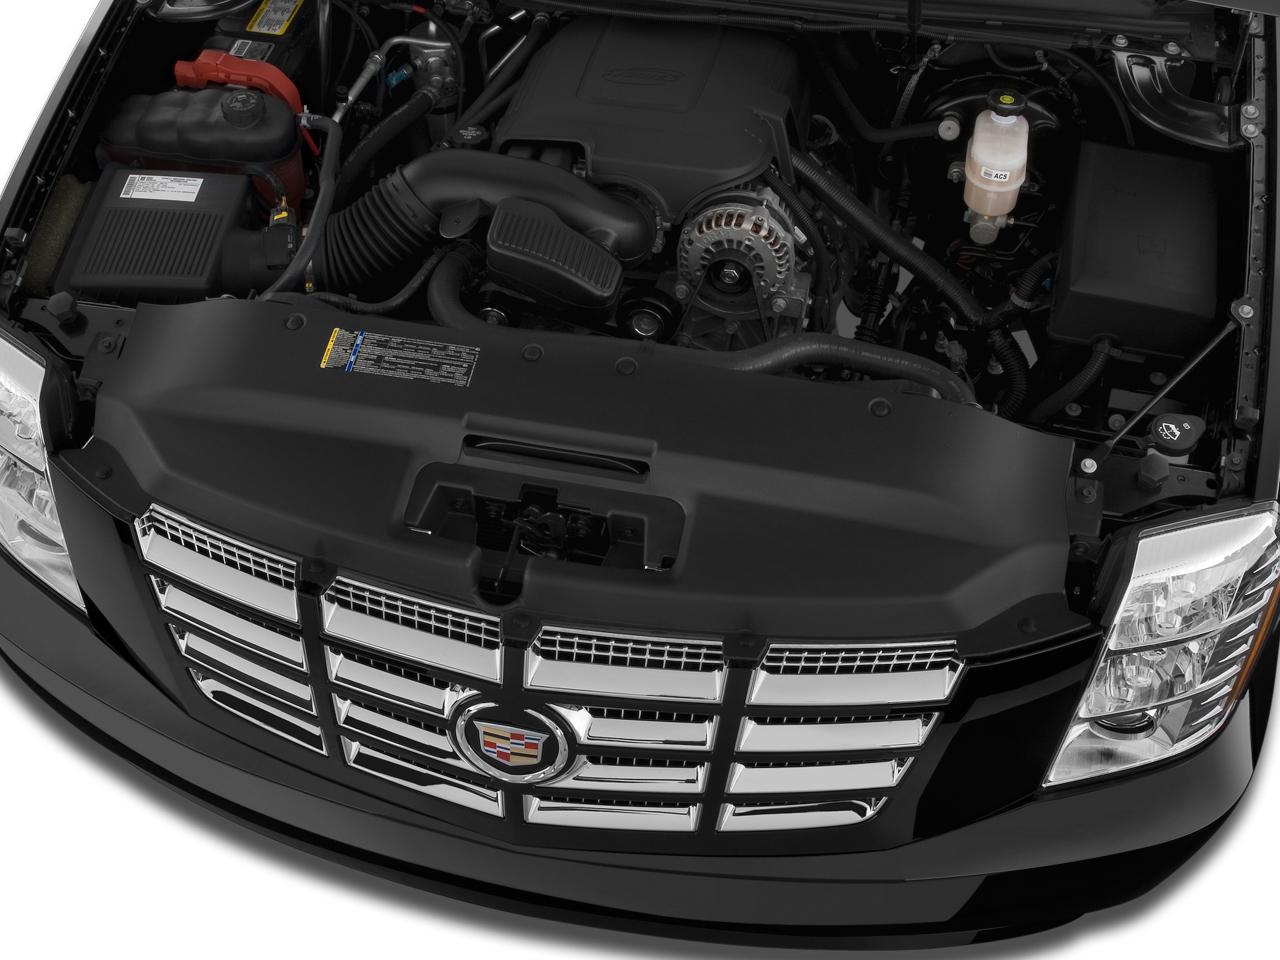 2009 Cadillac Escalade Hybrid - First Drive Cadillac ...